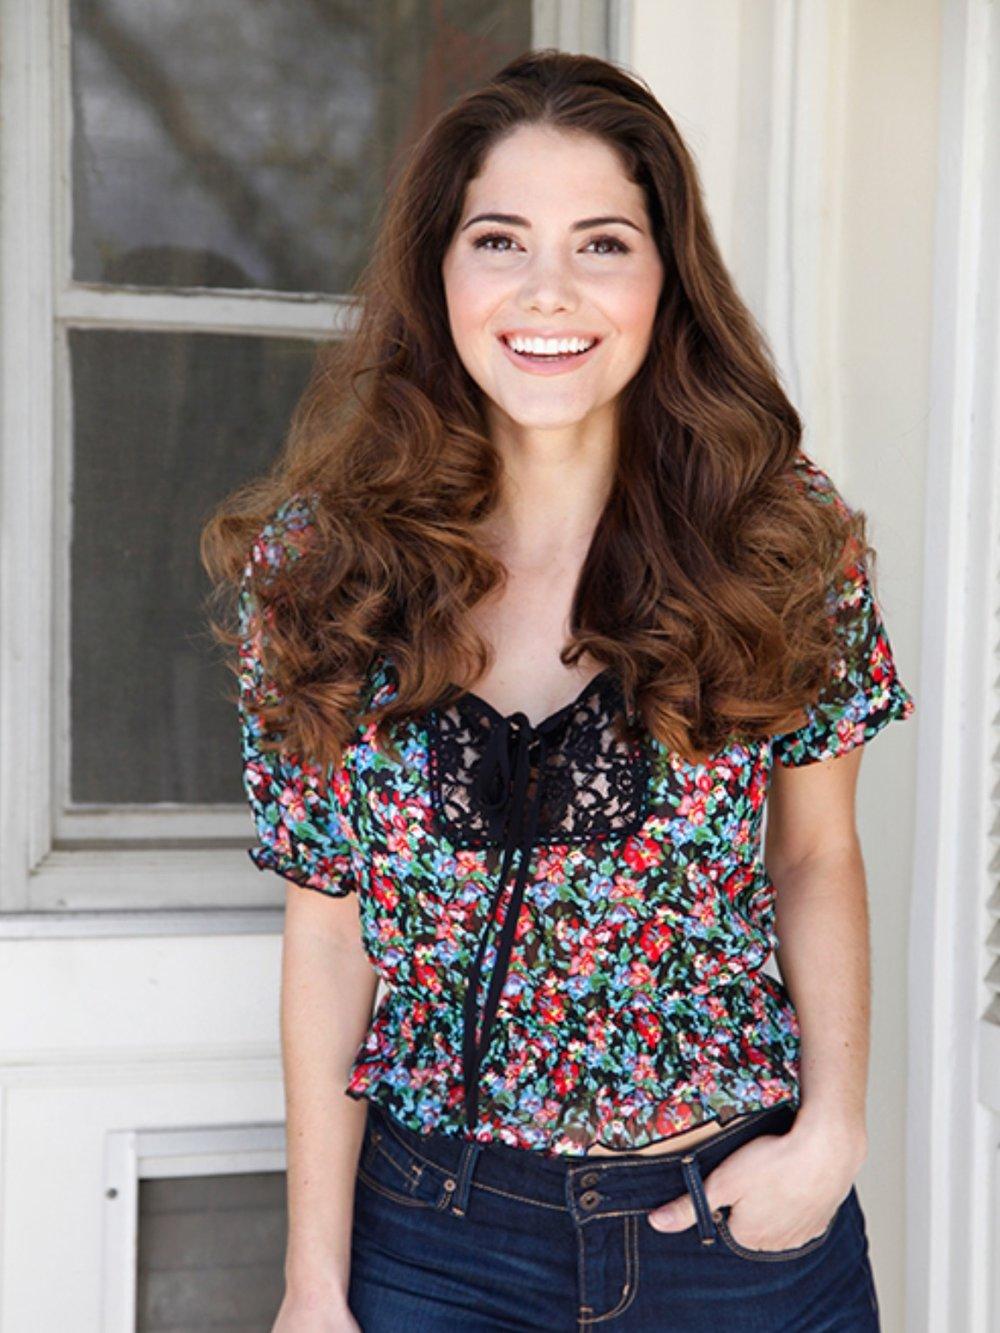 Brittany - Height: 5'9Origin: Santa MonicaBio: Talented actress &internationalmodel from California